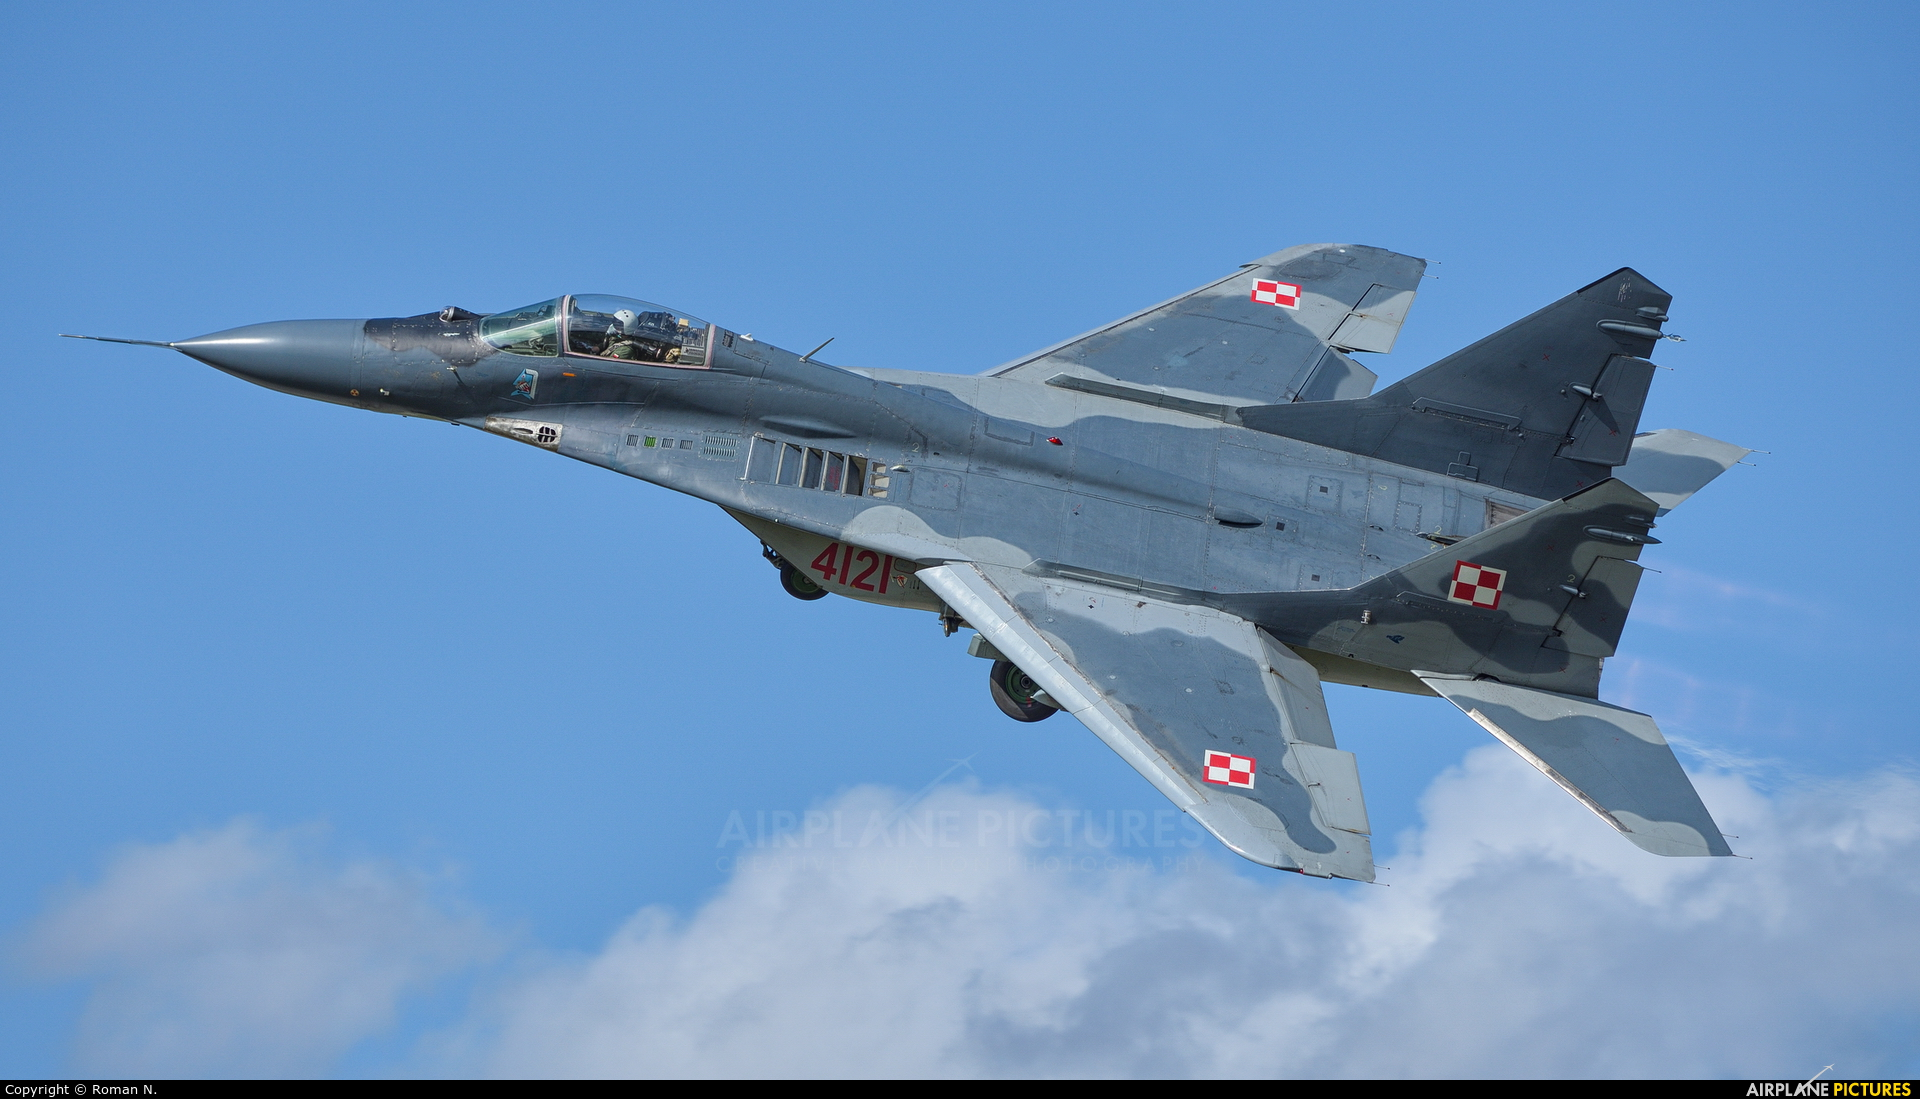 Poland - Air Force 4121 aircraft at Świdwin